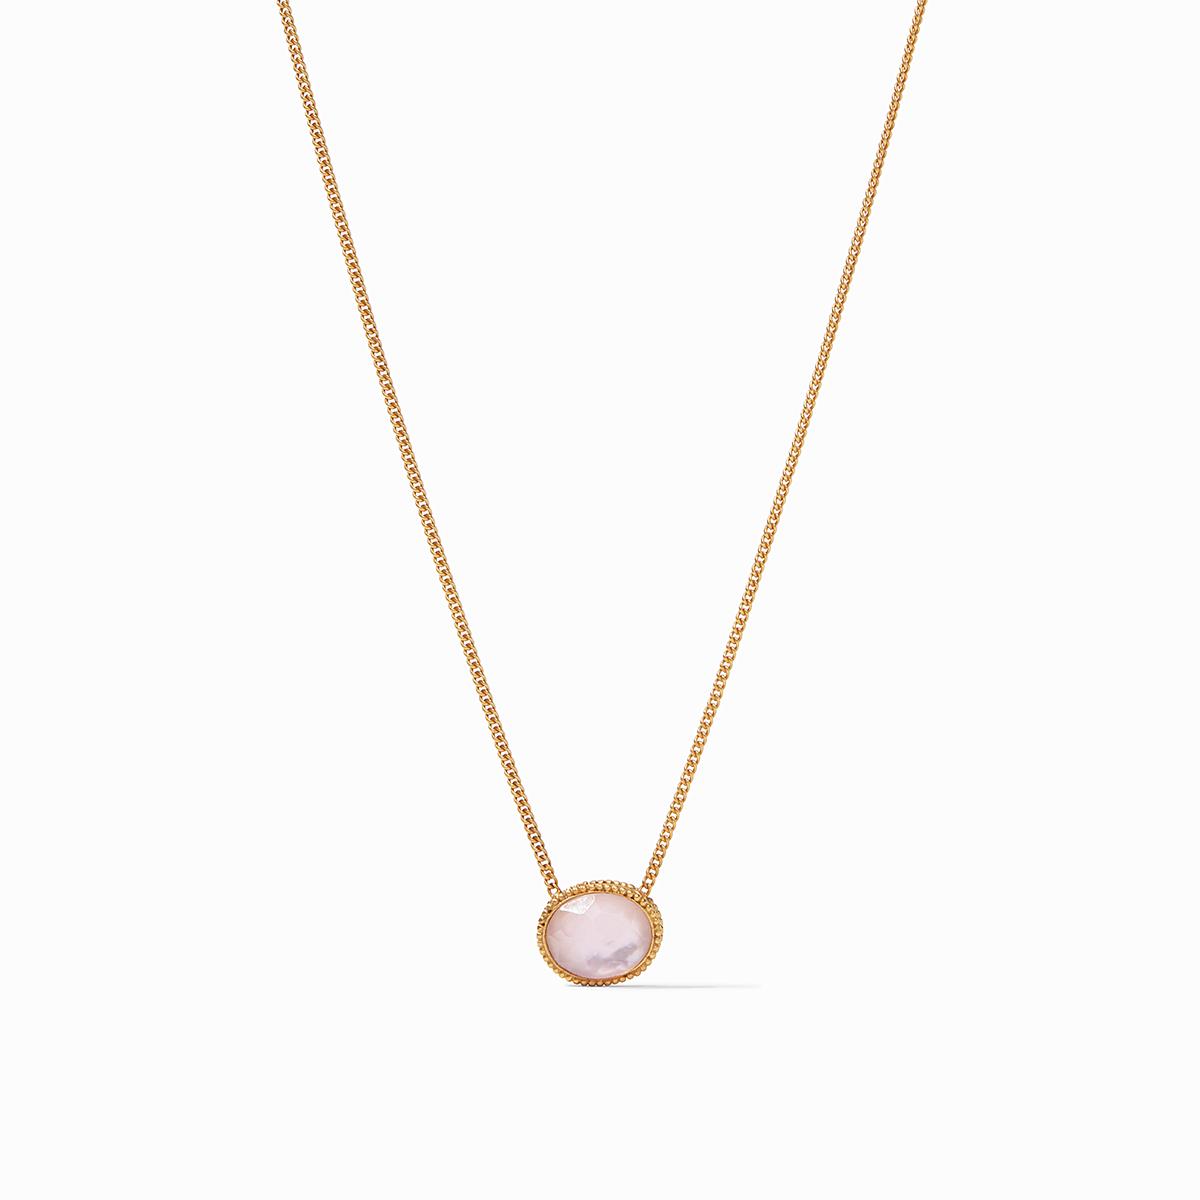 Verona Solitaire Necklace Iridescent Rose